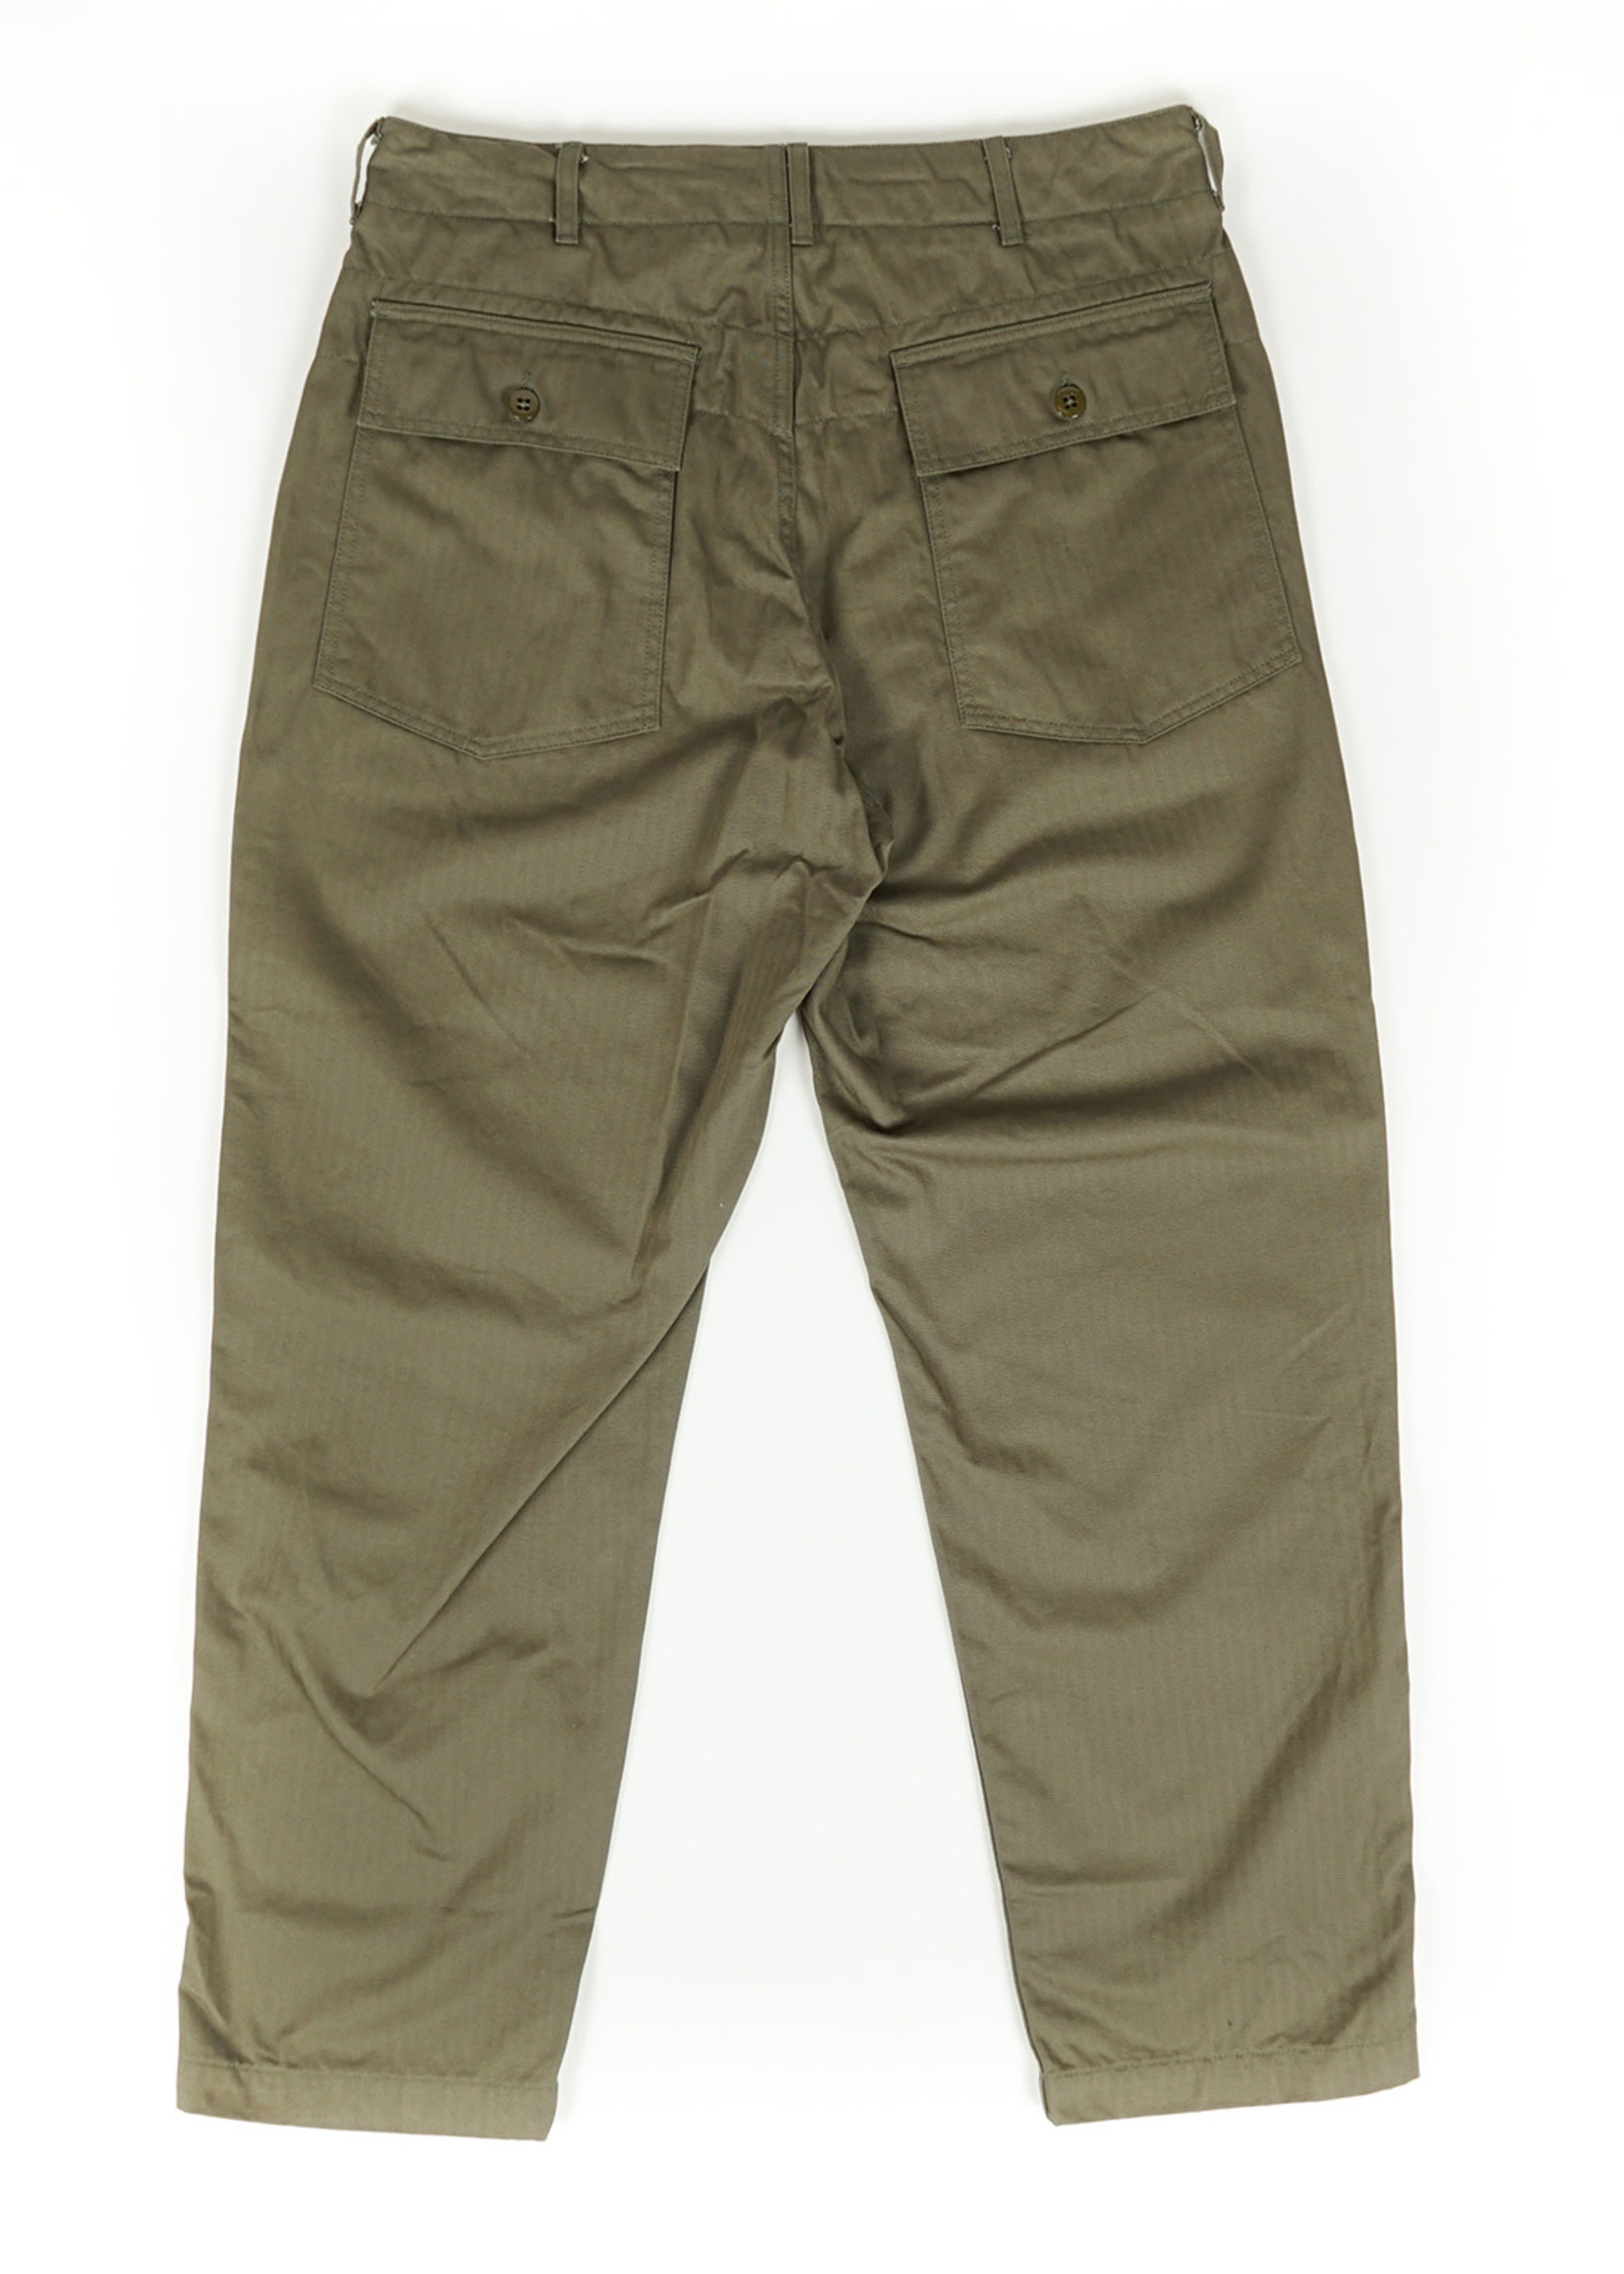 Engineered Garments Fatigue Pant Olive Cotton Herringbone Twill by Engineered Garments